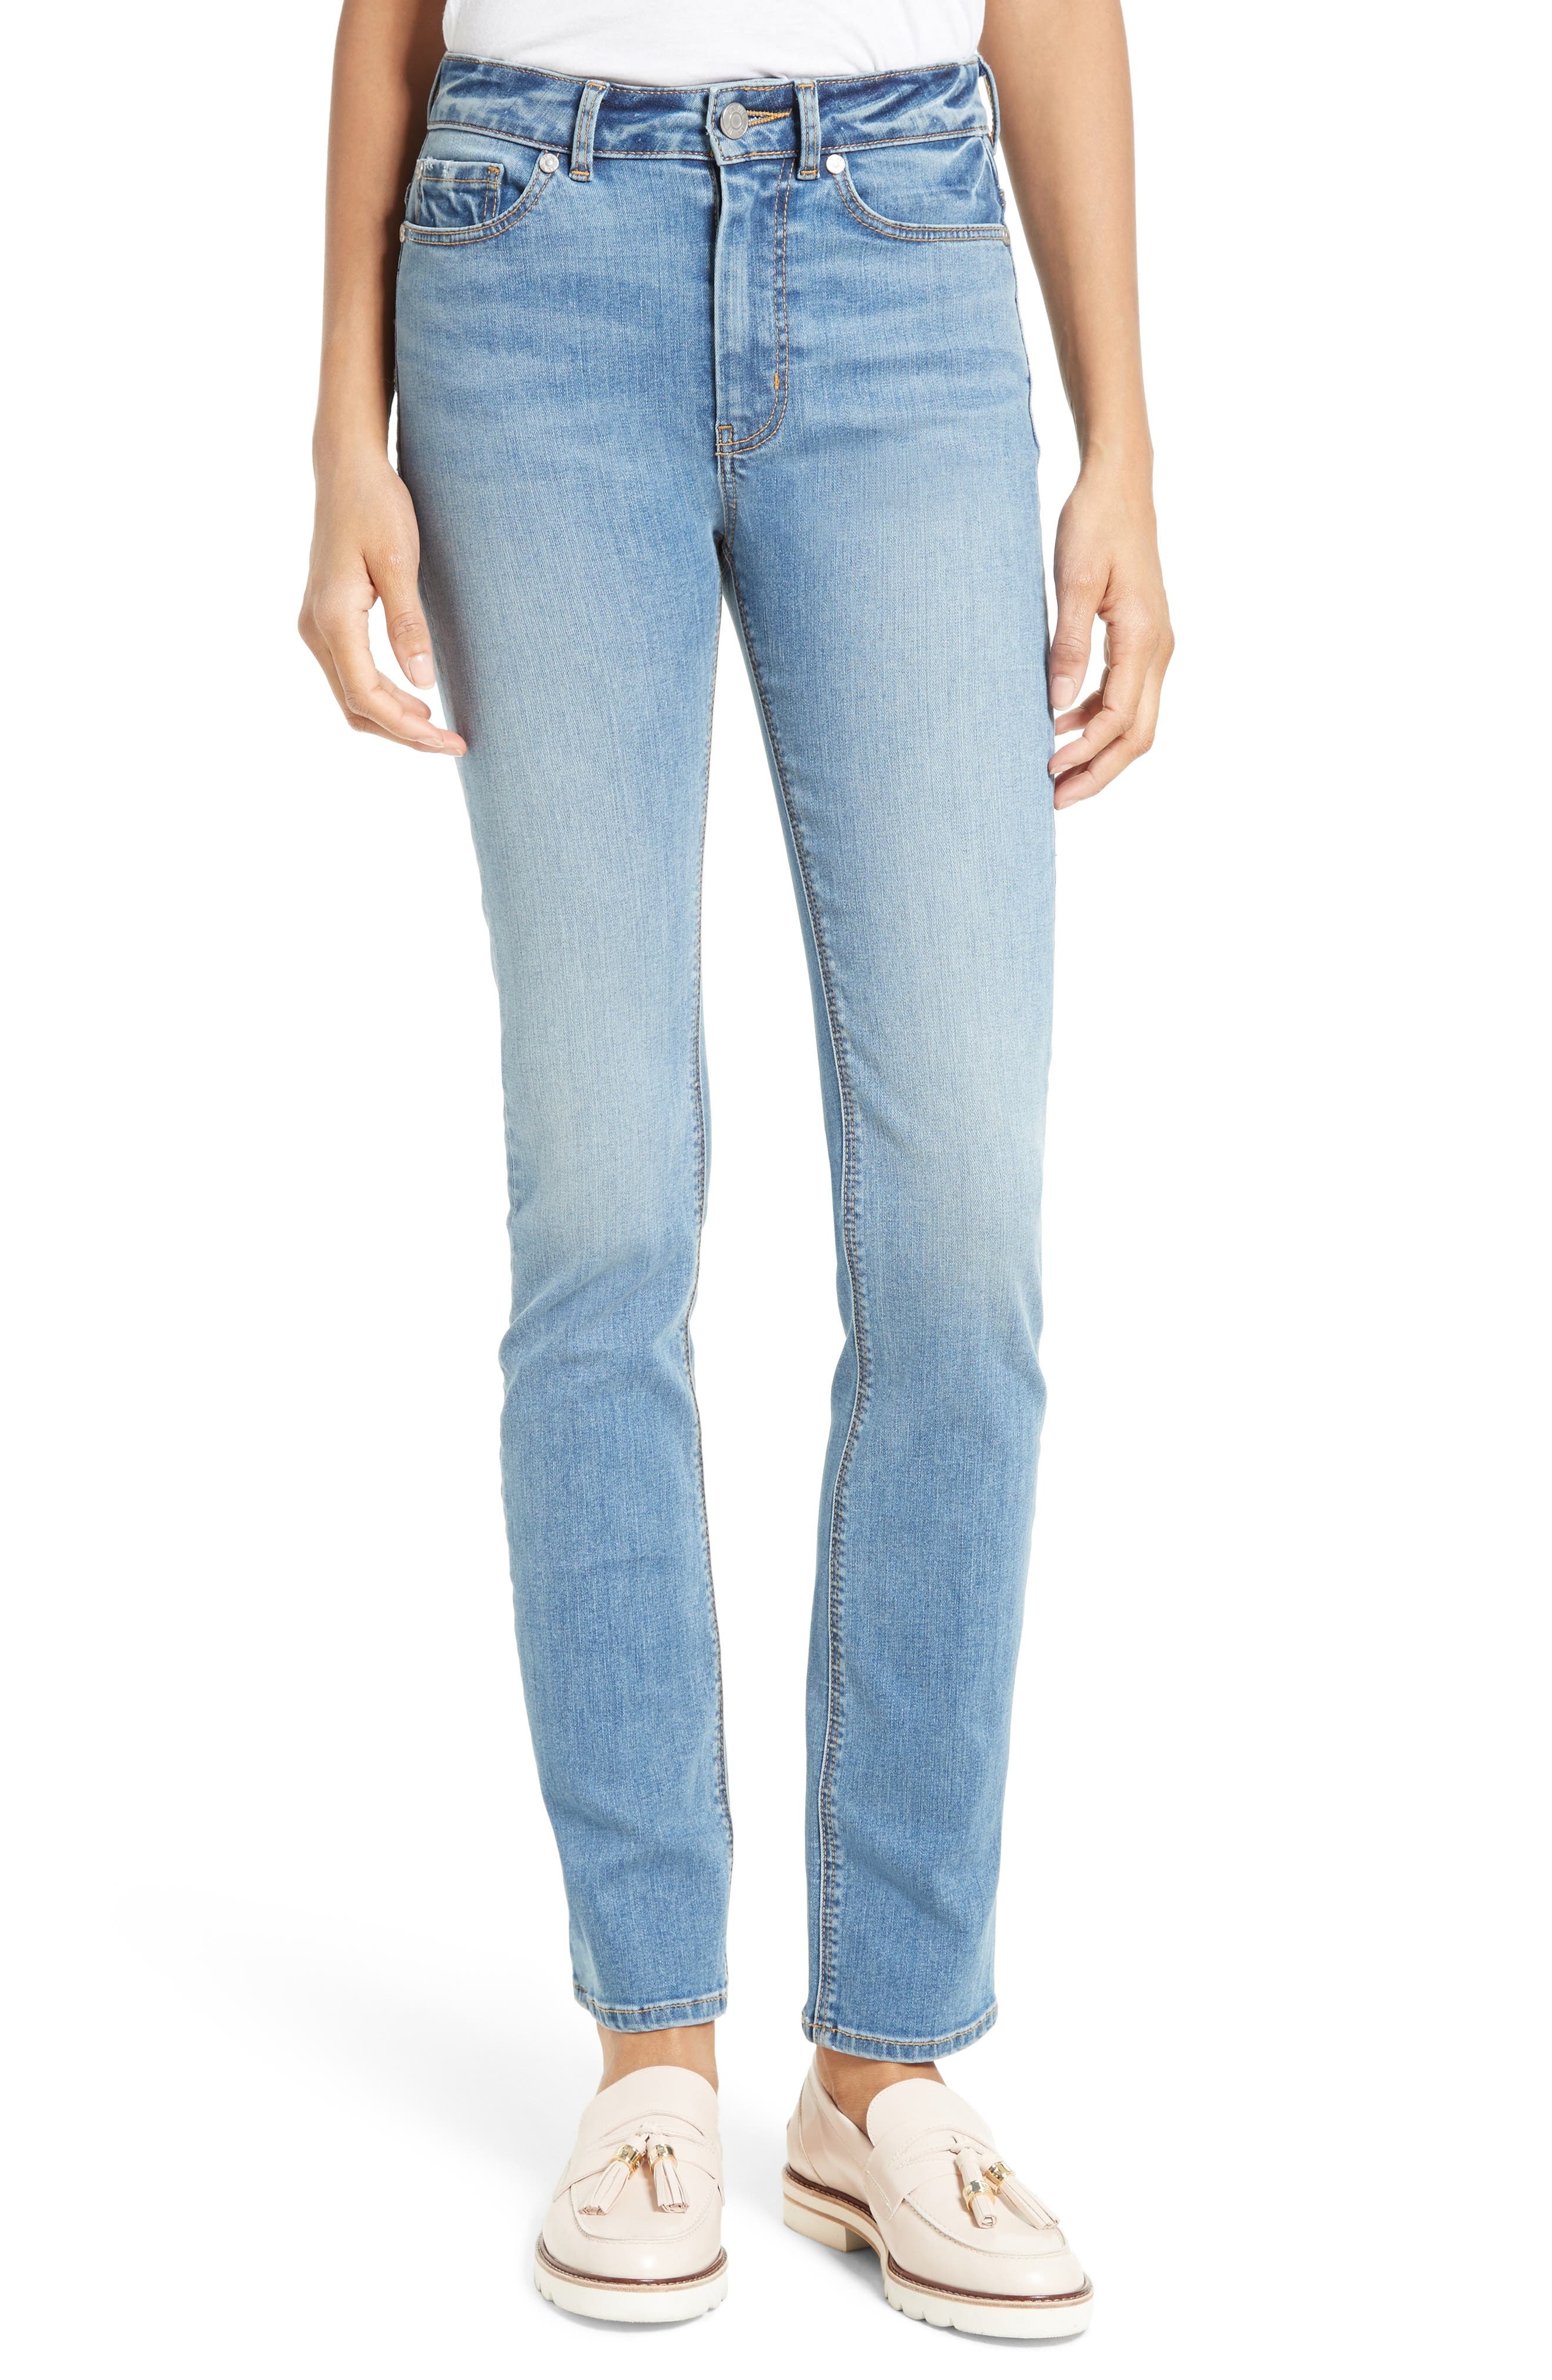 LA VIE REBECCA TAYLOR Clemence Slim Ankle Jeans